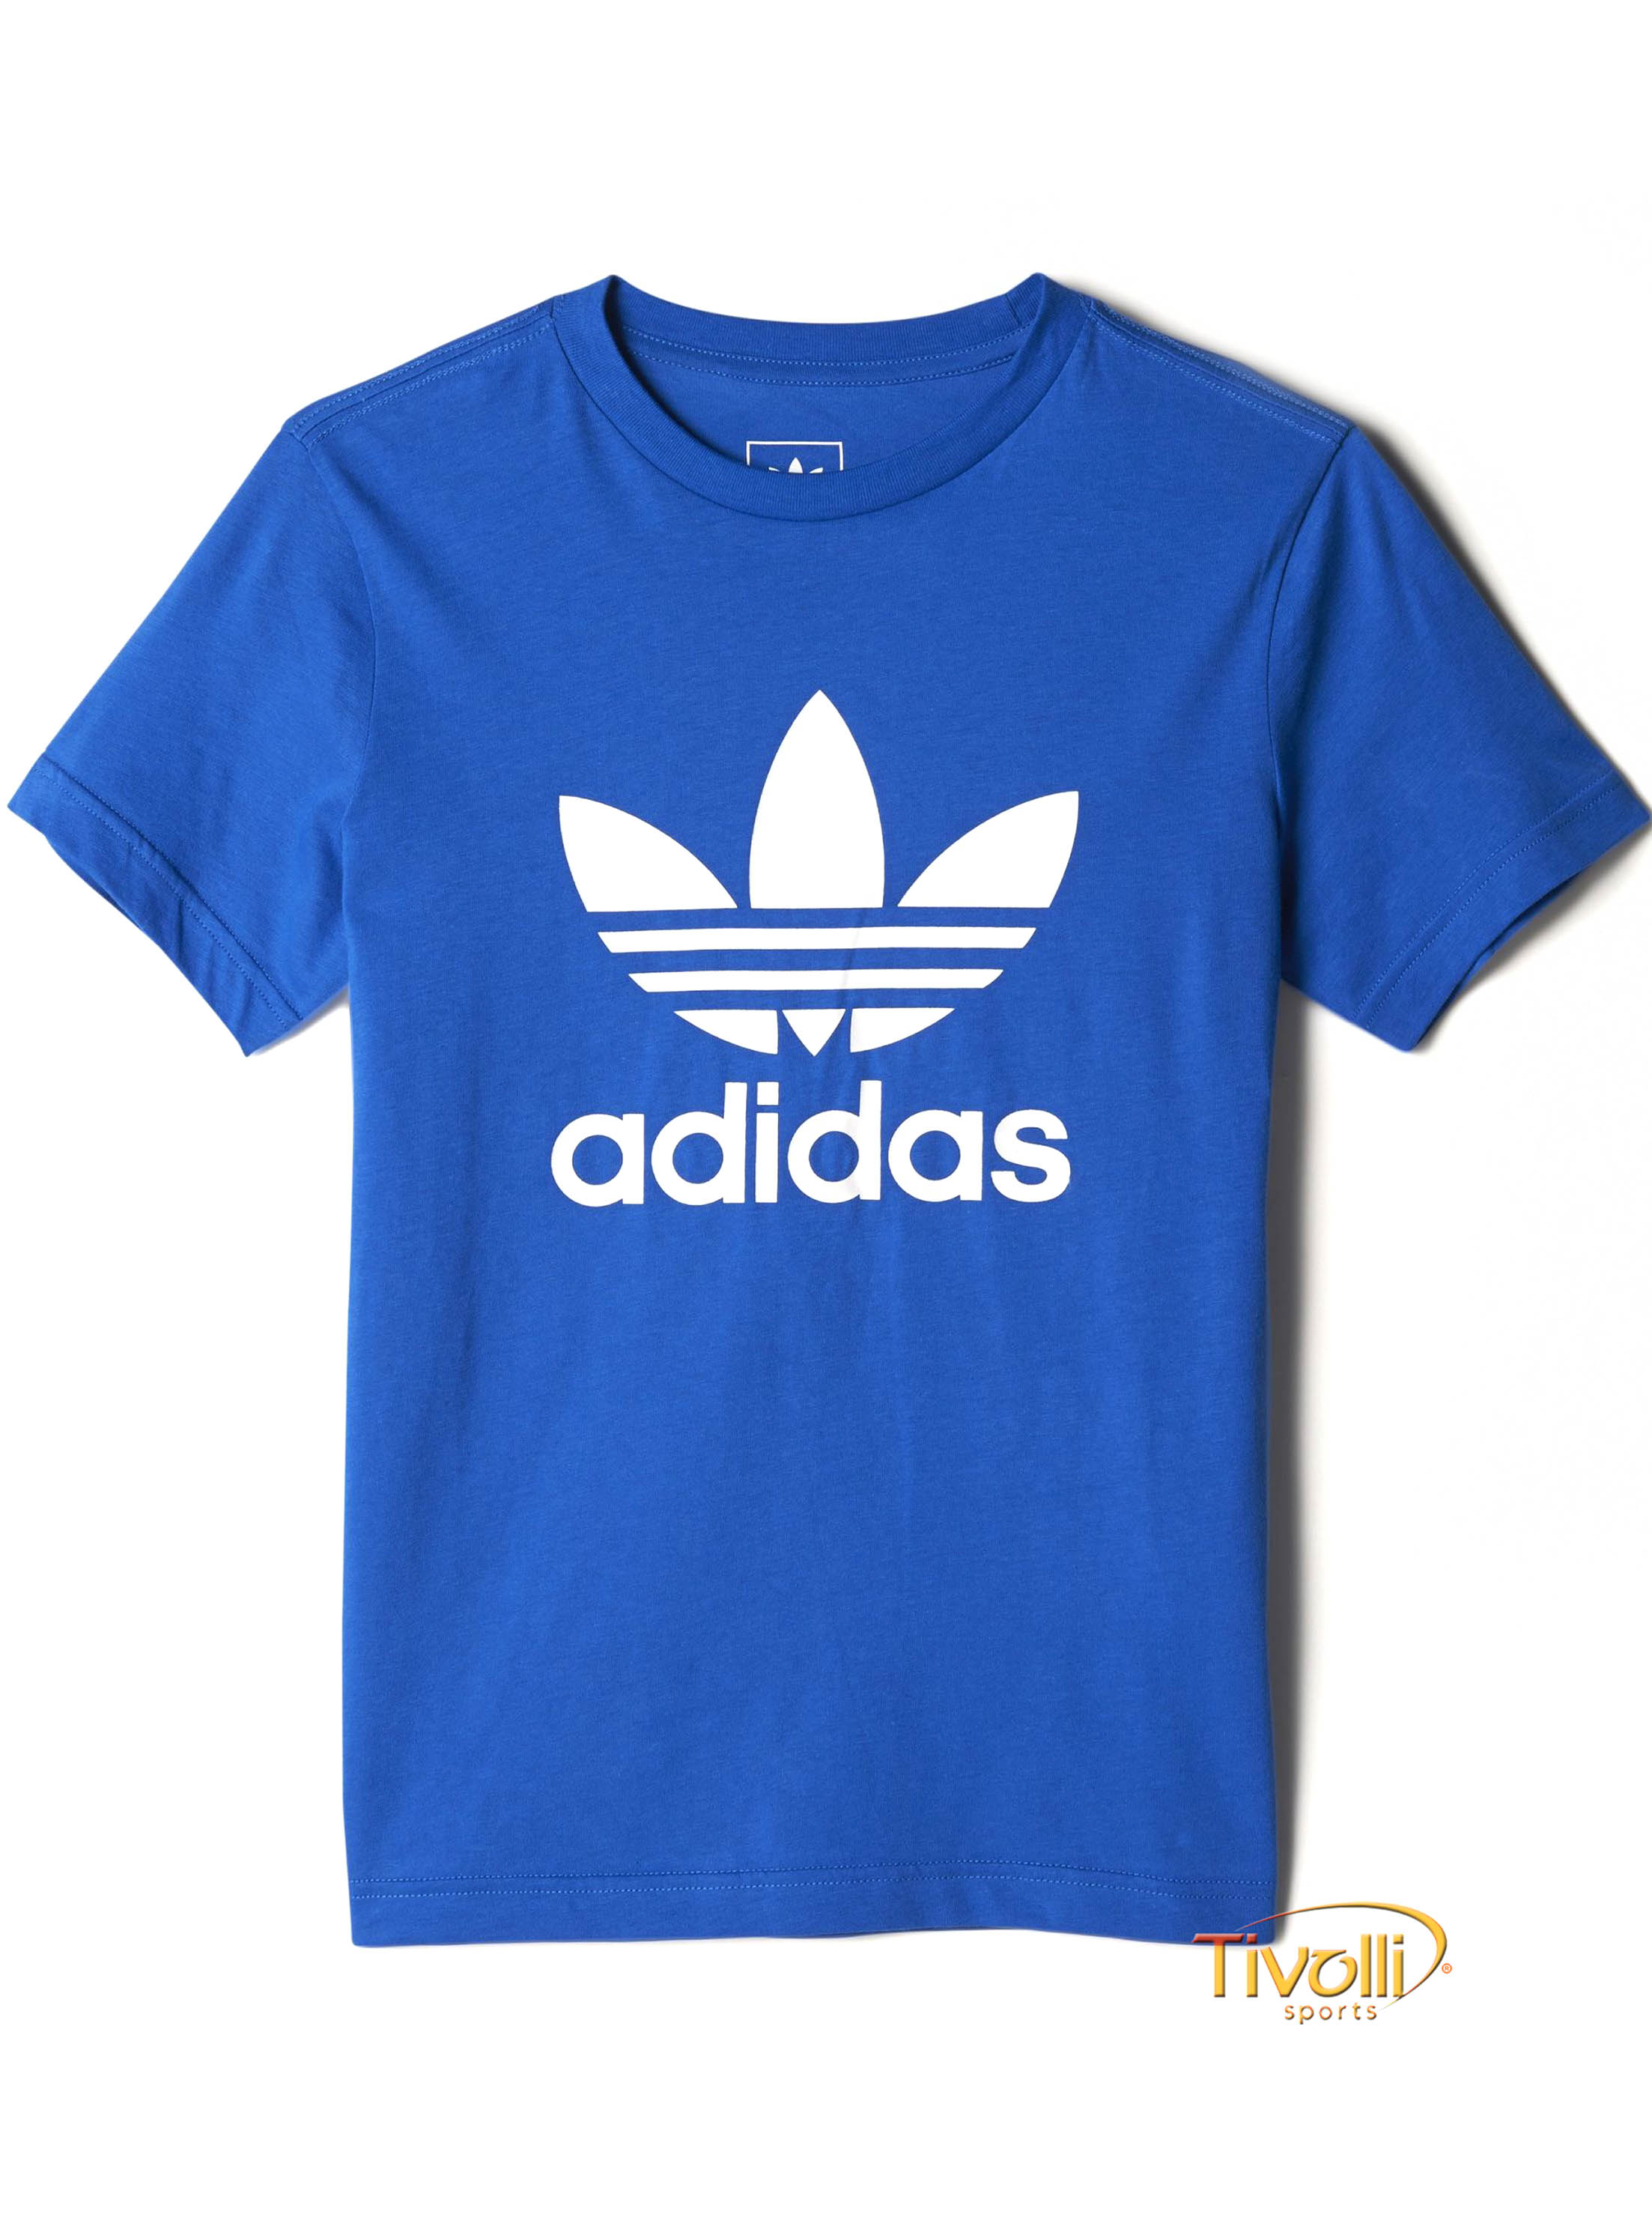 5cd25cbb37 Camiseta Infantil Adidas Trefoil   Azul Royal